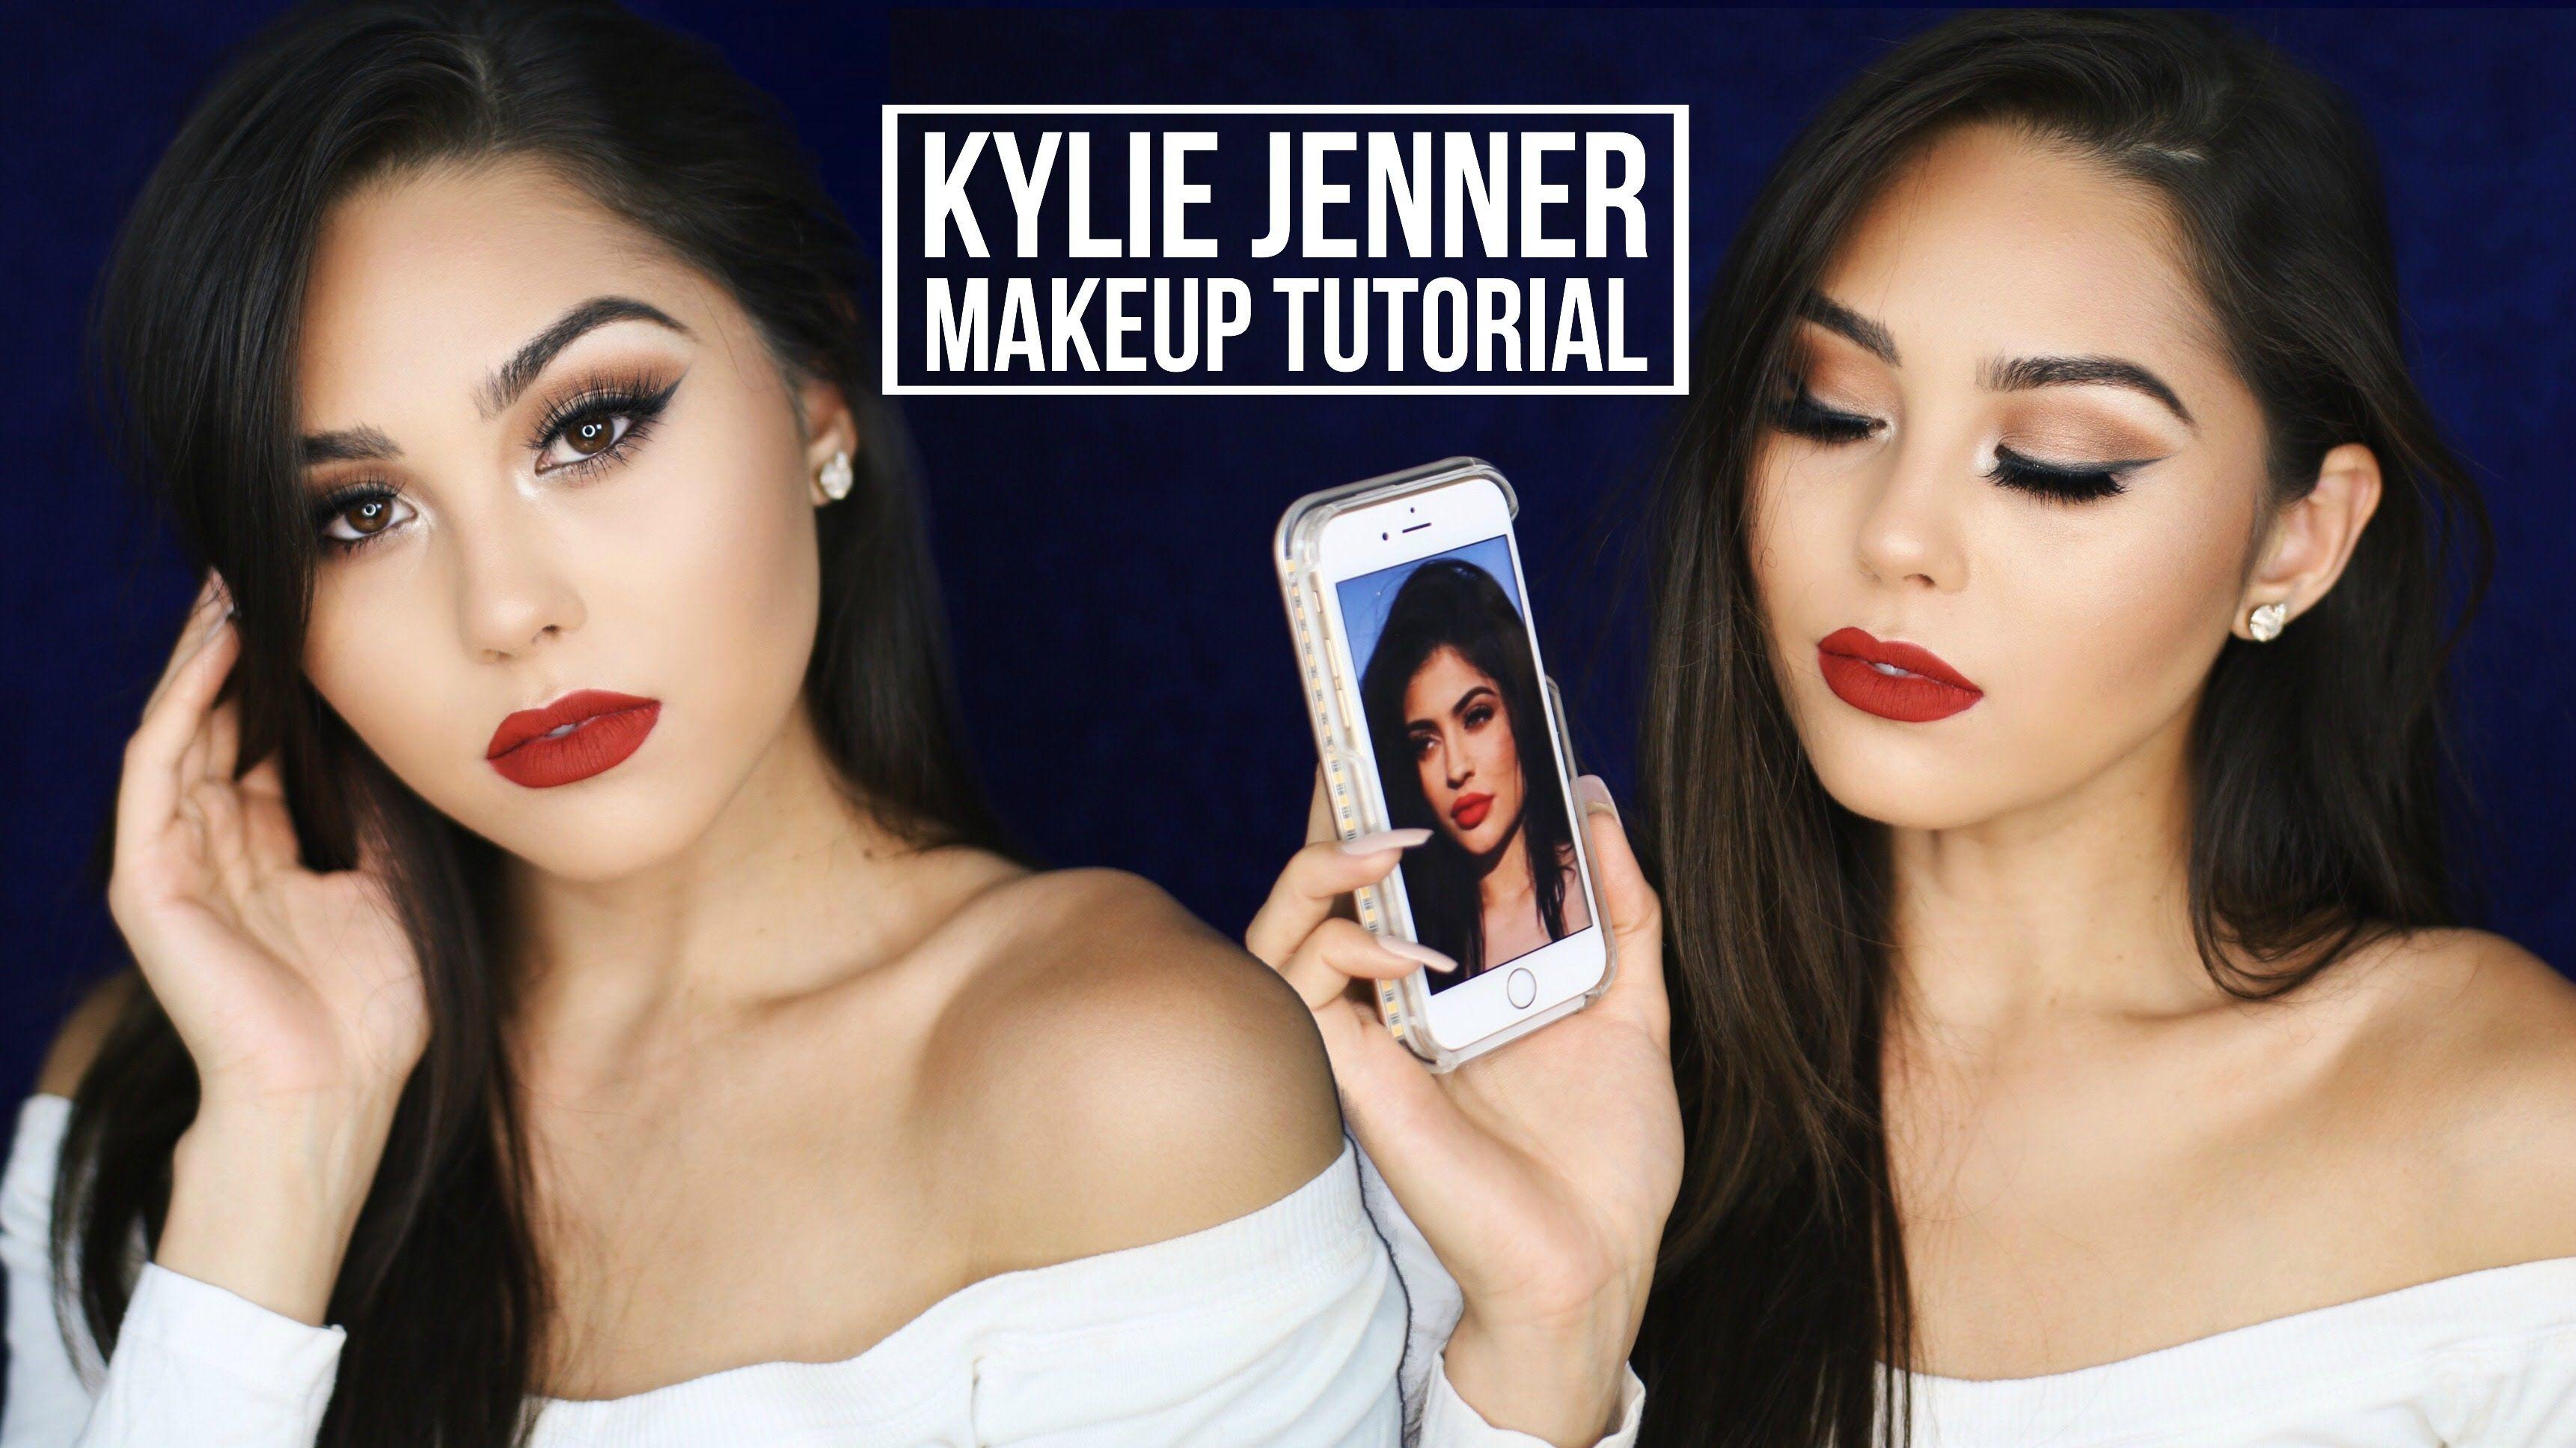 Kylie Jenner Inspired Fall Makeup Tutorial 2016 | Bronze ...